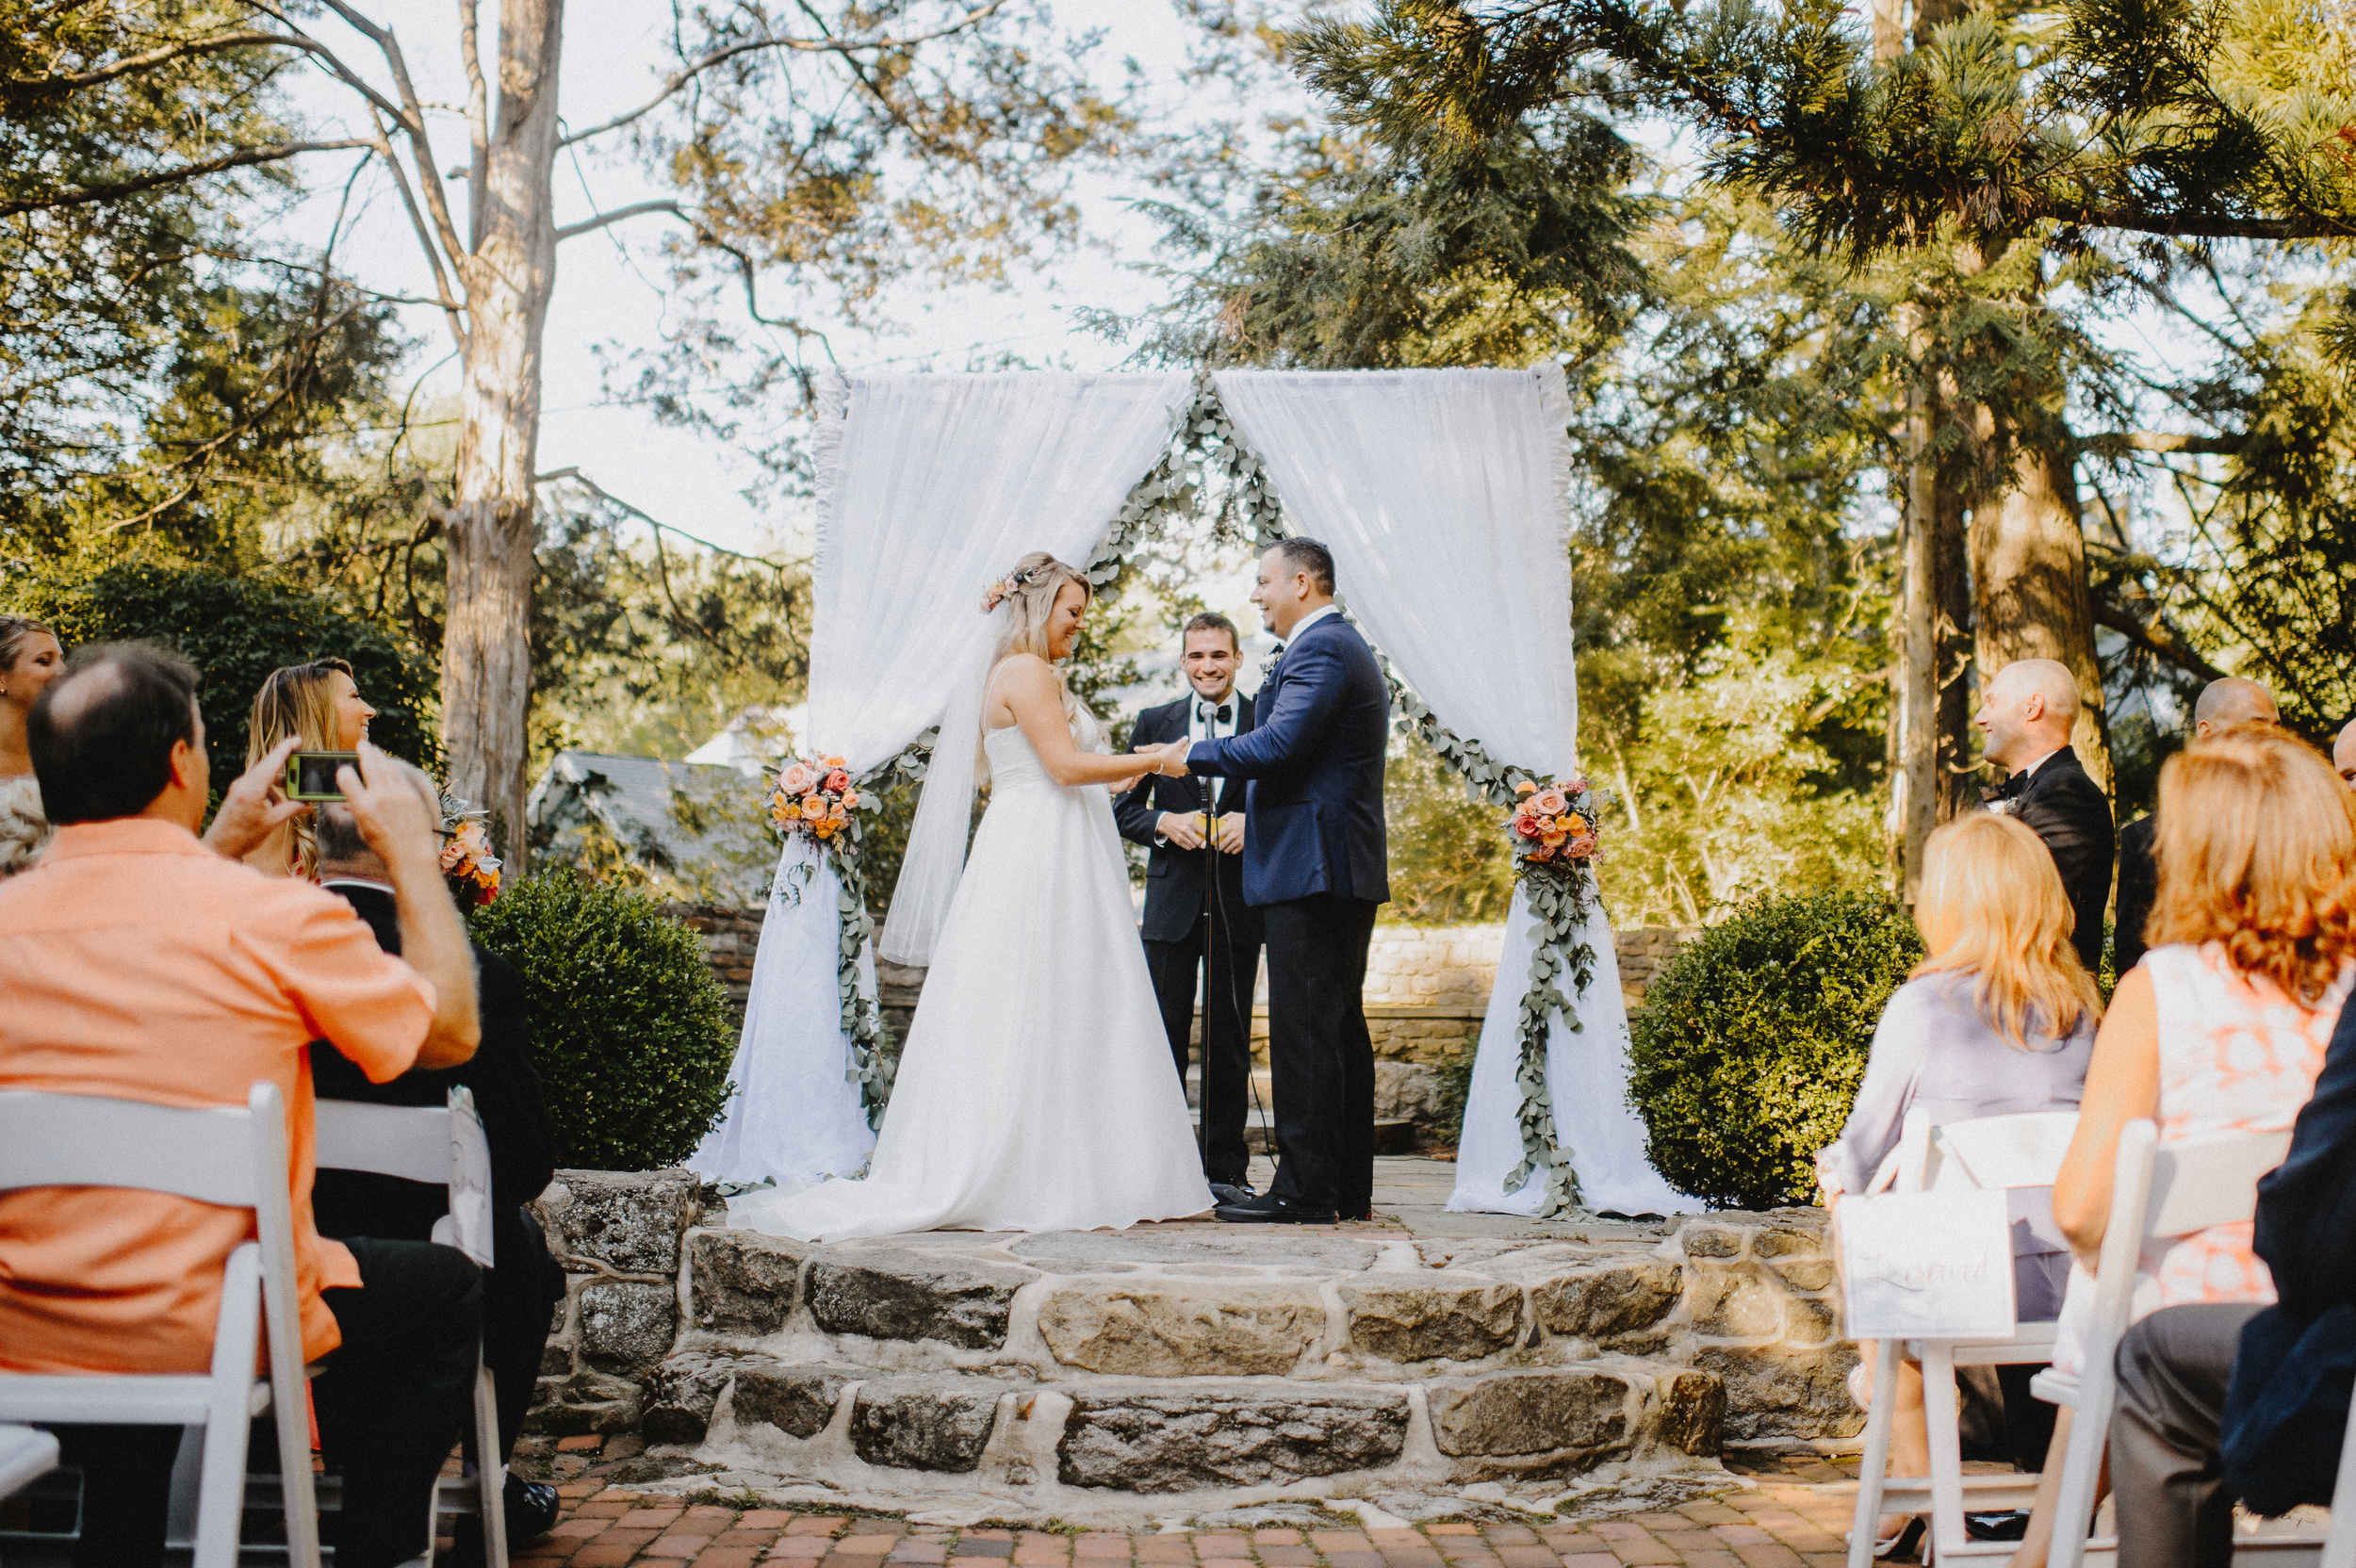 holly-hedge-estate-wedding-photographer-pat-robinson-photography-61.jpg